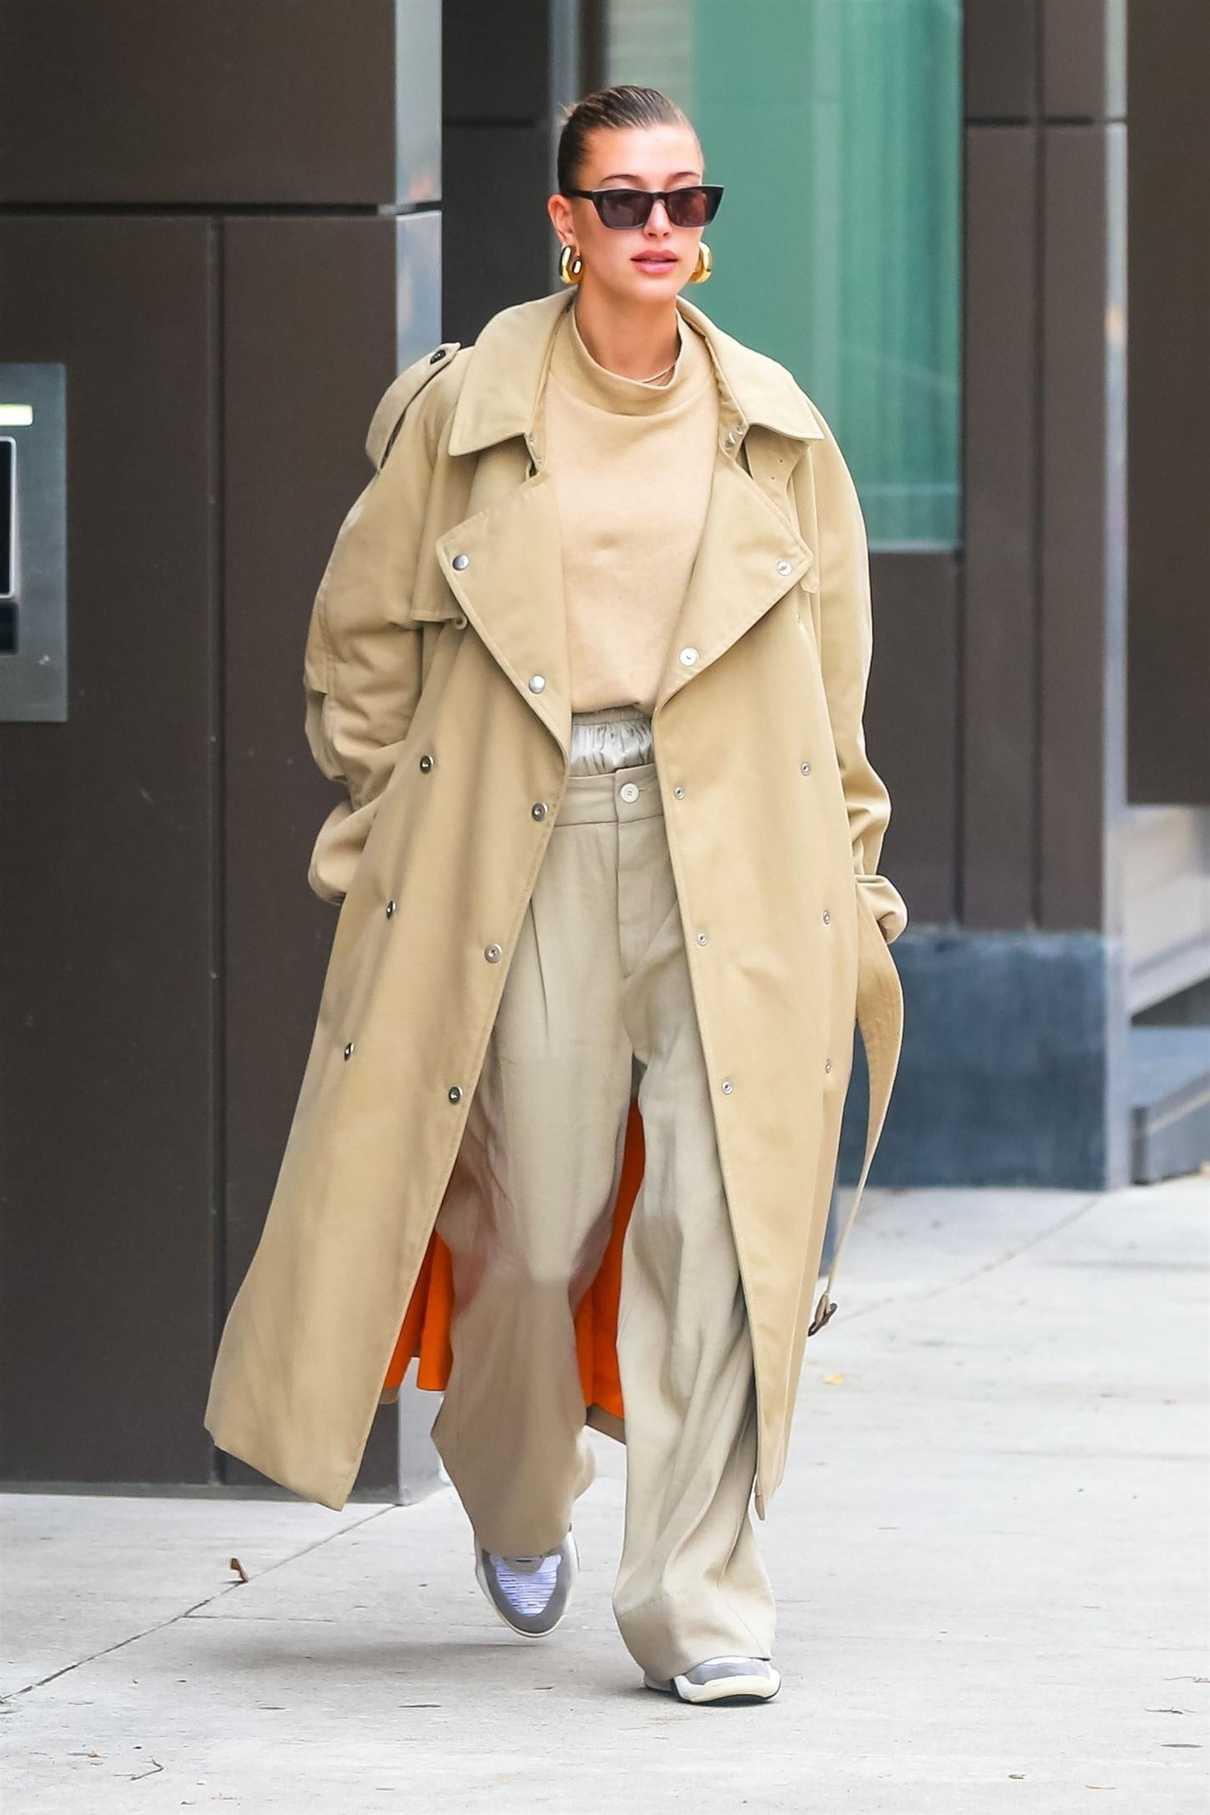 Hailey Baldwin in a Beige Trench Coat